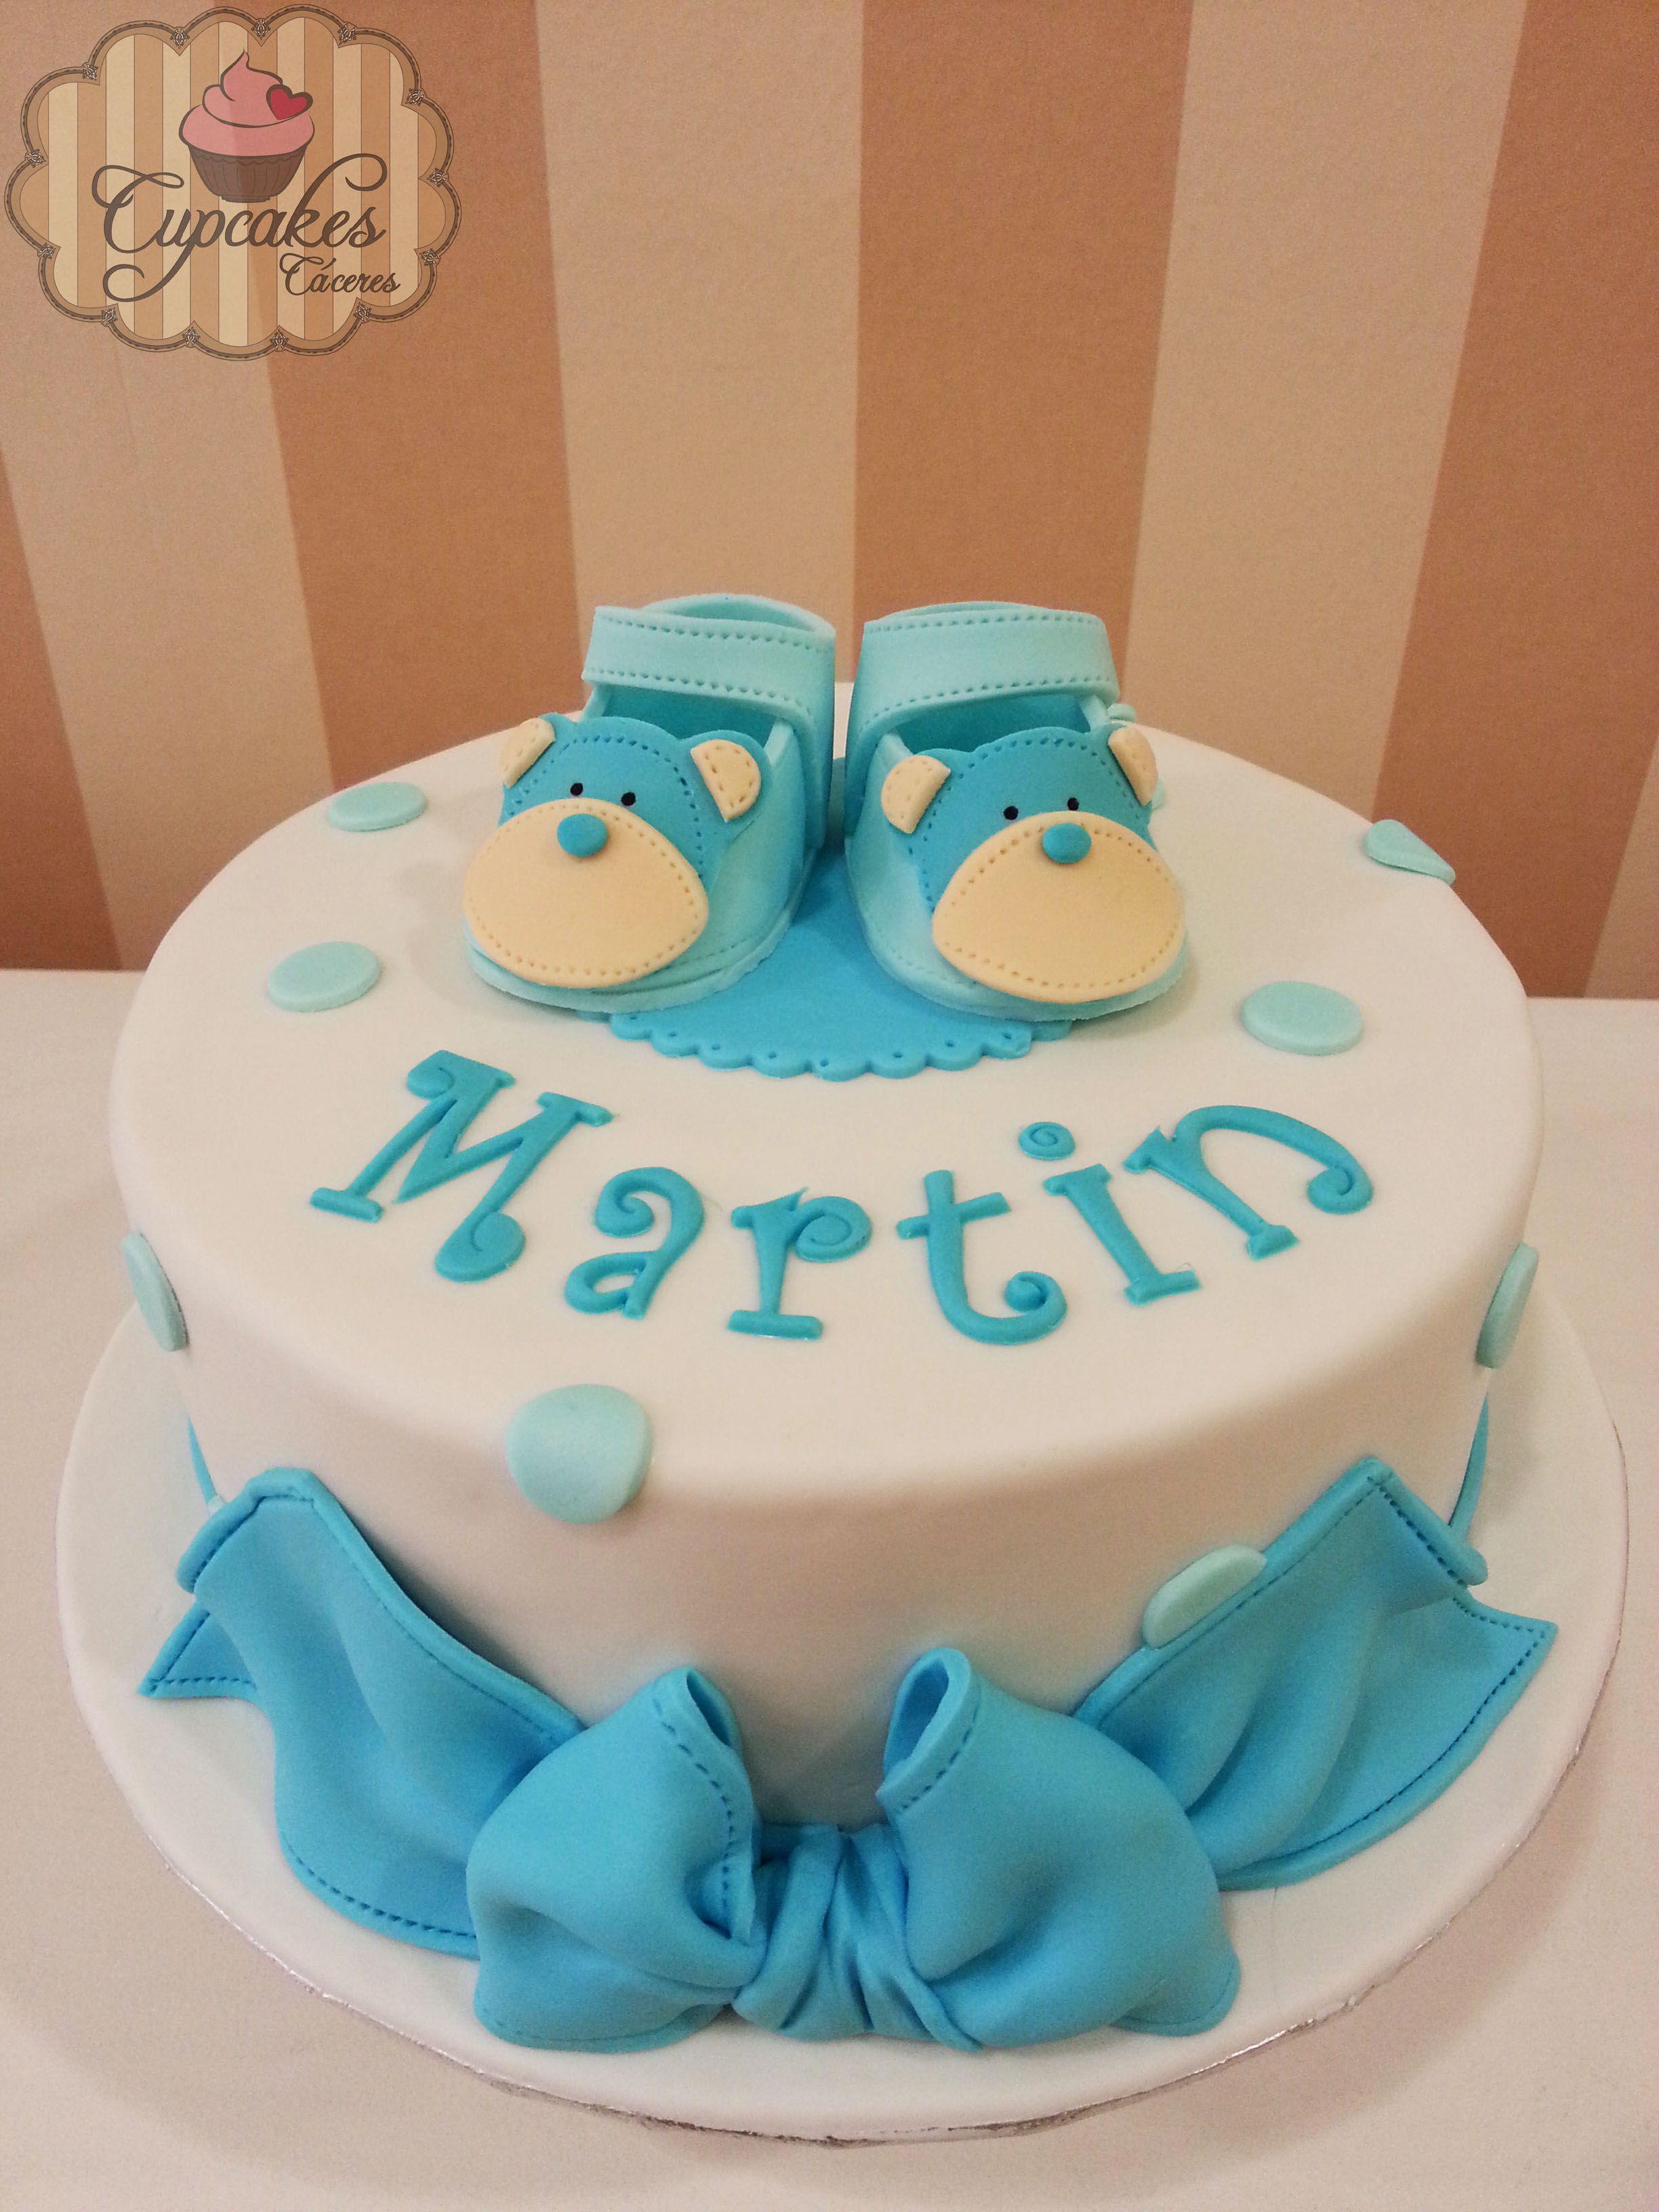 Tarta De Bautizo Para Niño Con Zapatos De Fondant Cake Birthday Cake Desserts